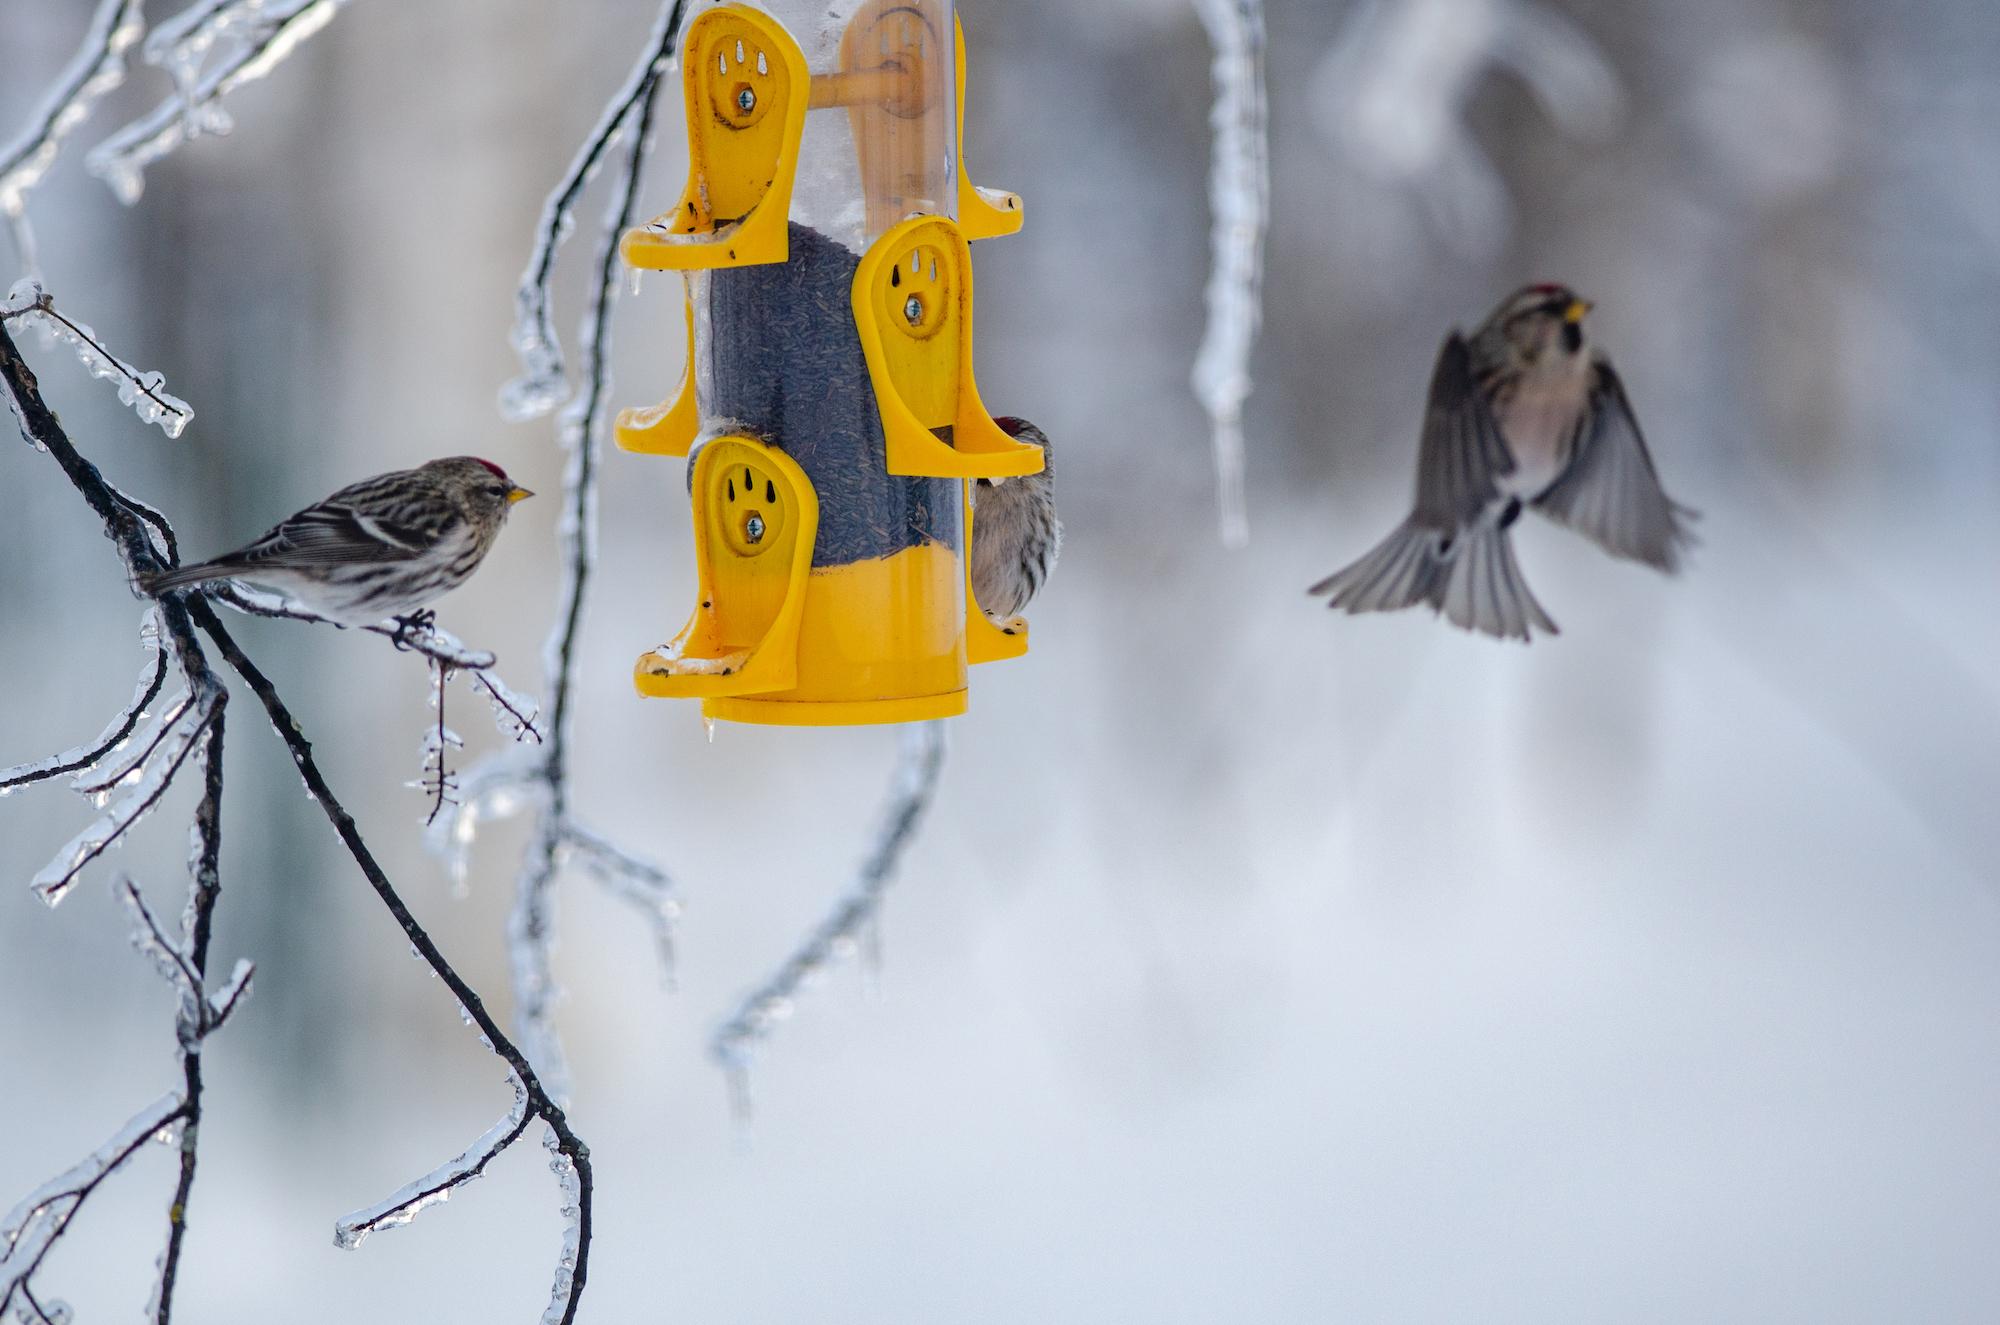 Catch rare sightings of winter wildlife in Michigan